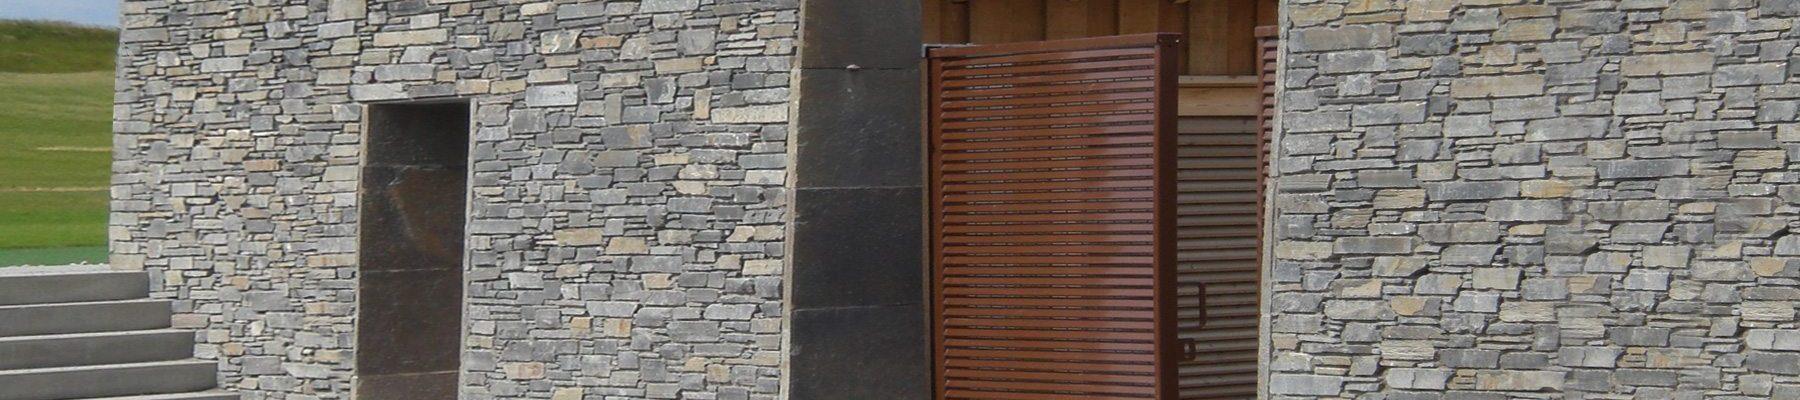 Banner_Italia-80_gates_Castle_Course_St Andrews_01